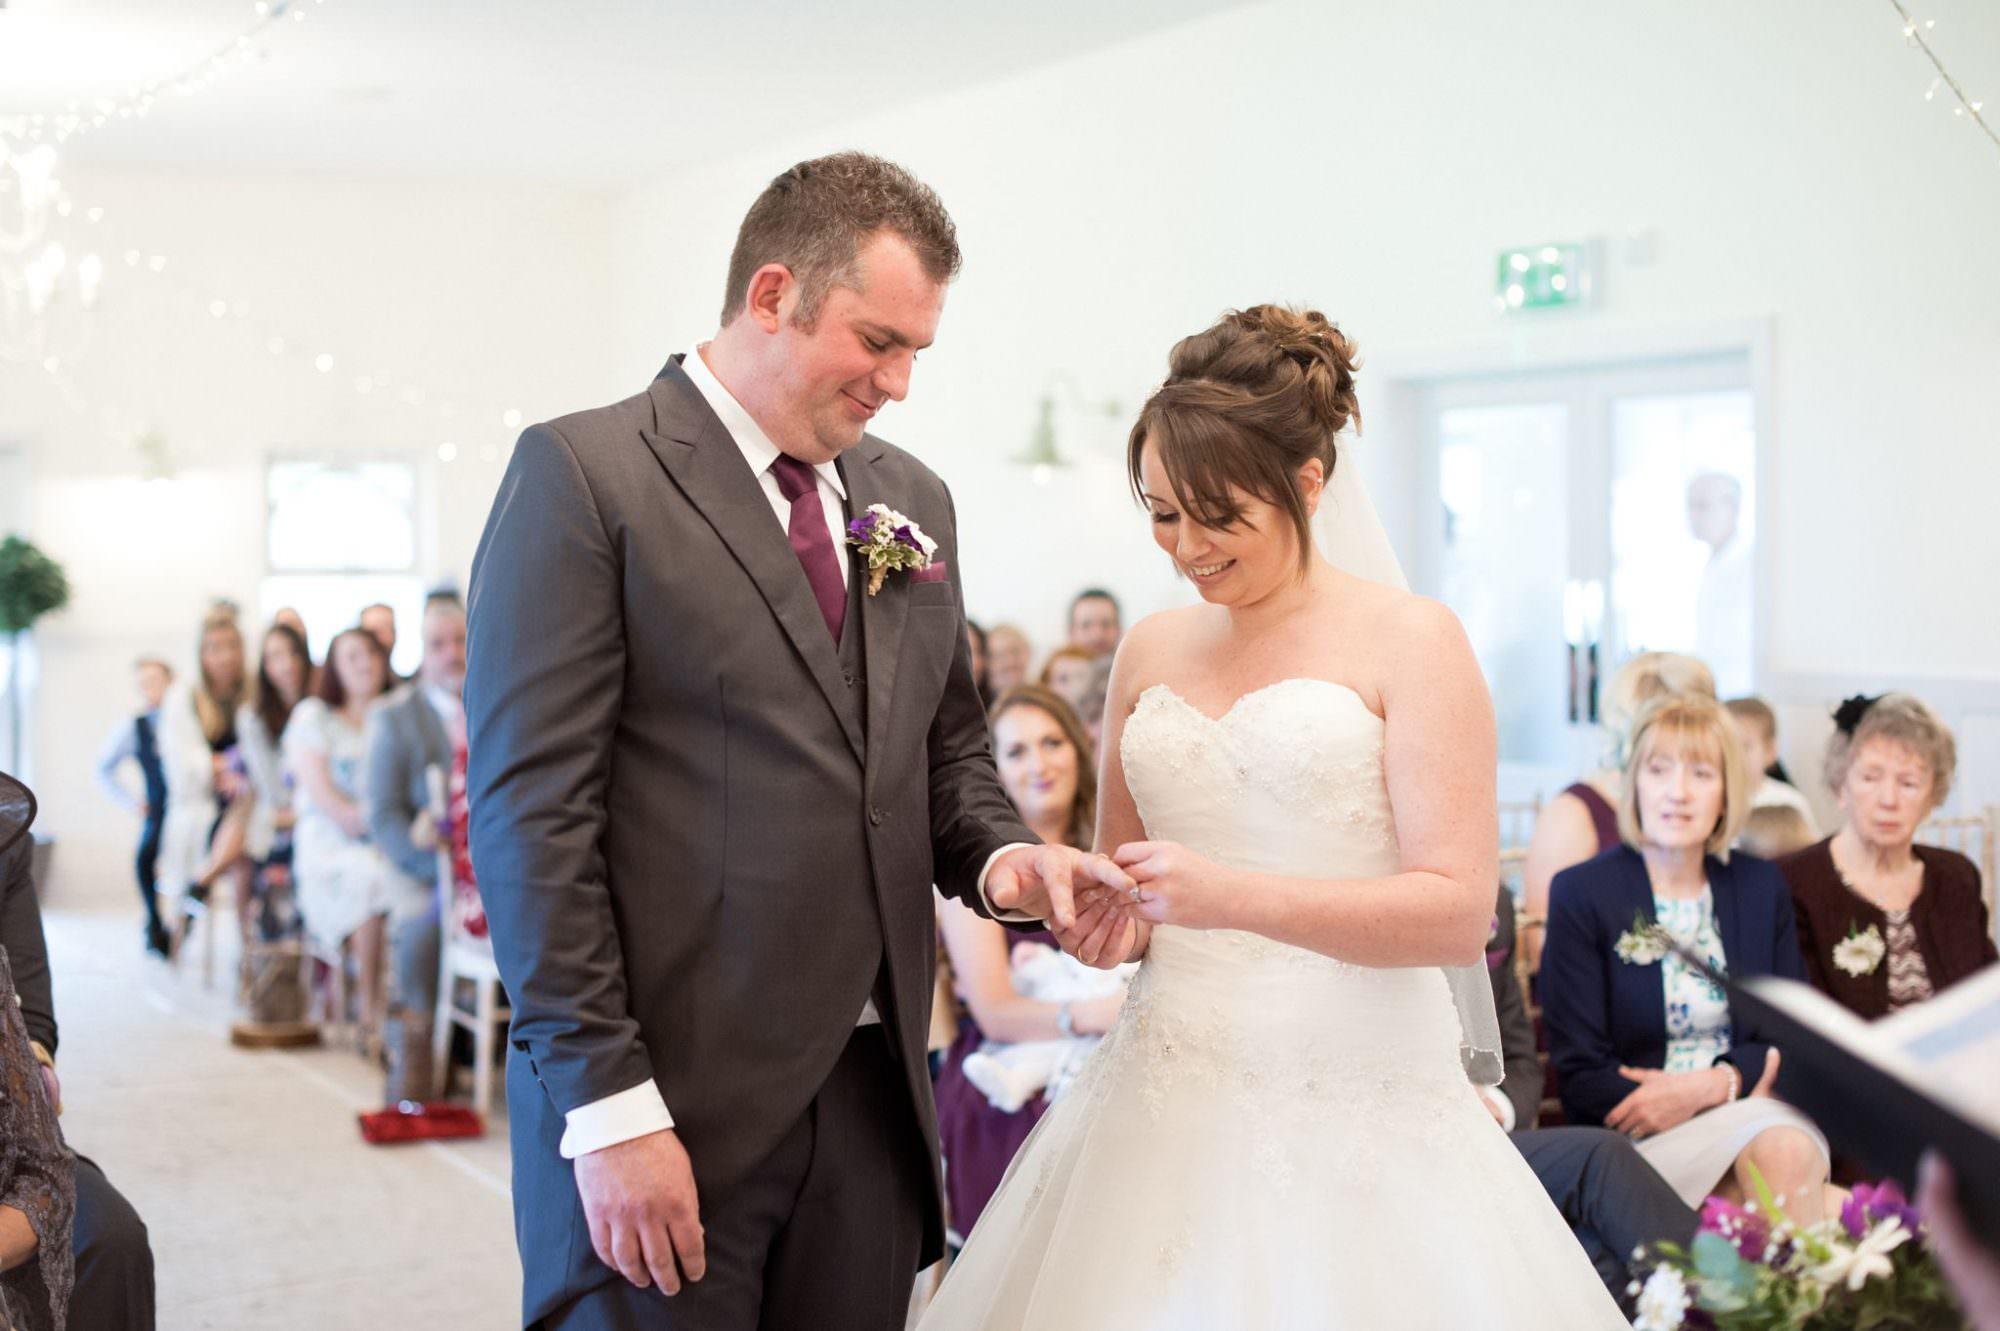 Wedding ceremony in Christchurch